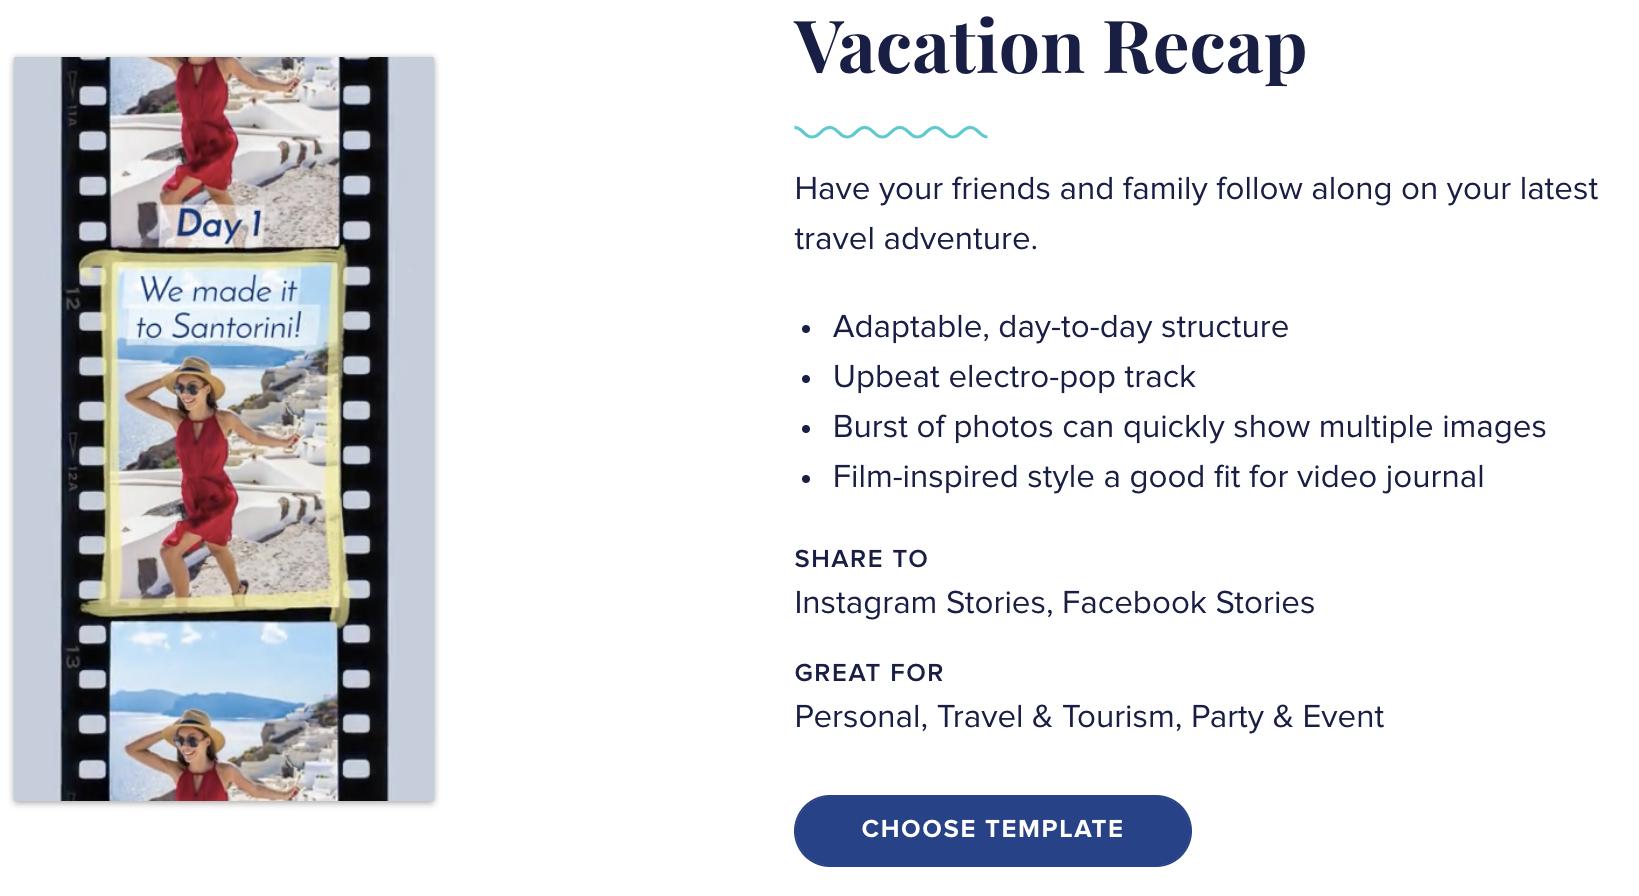 vacation-recap-memories-video